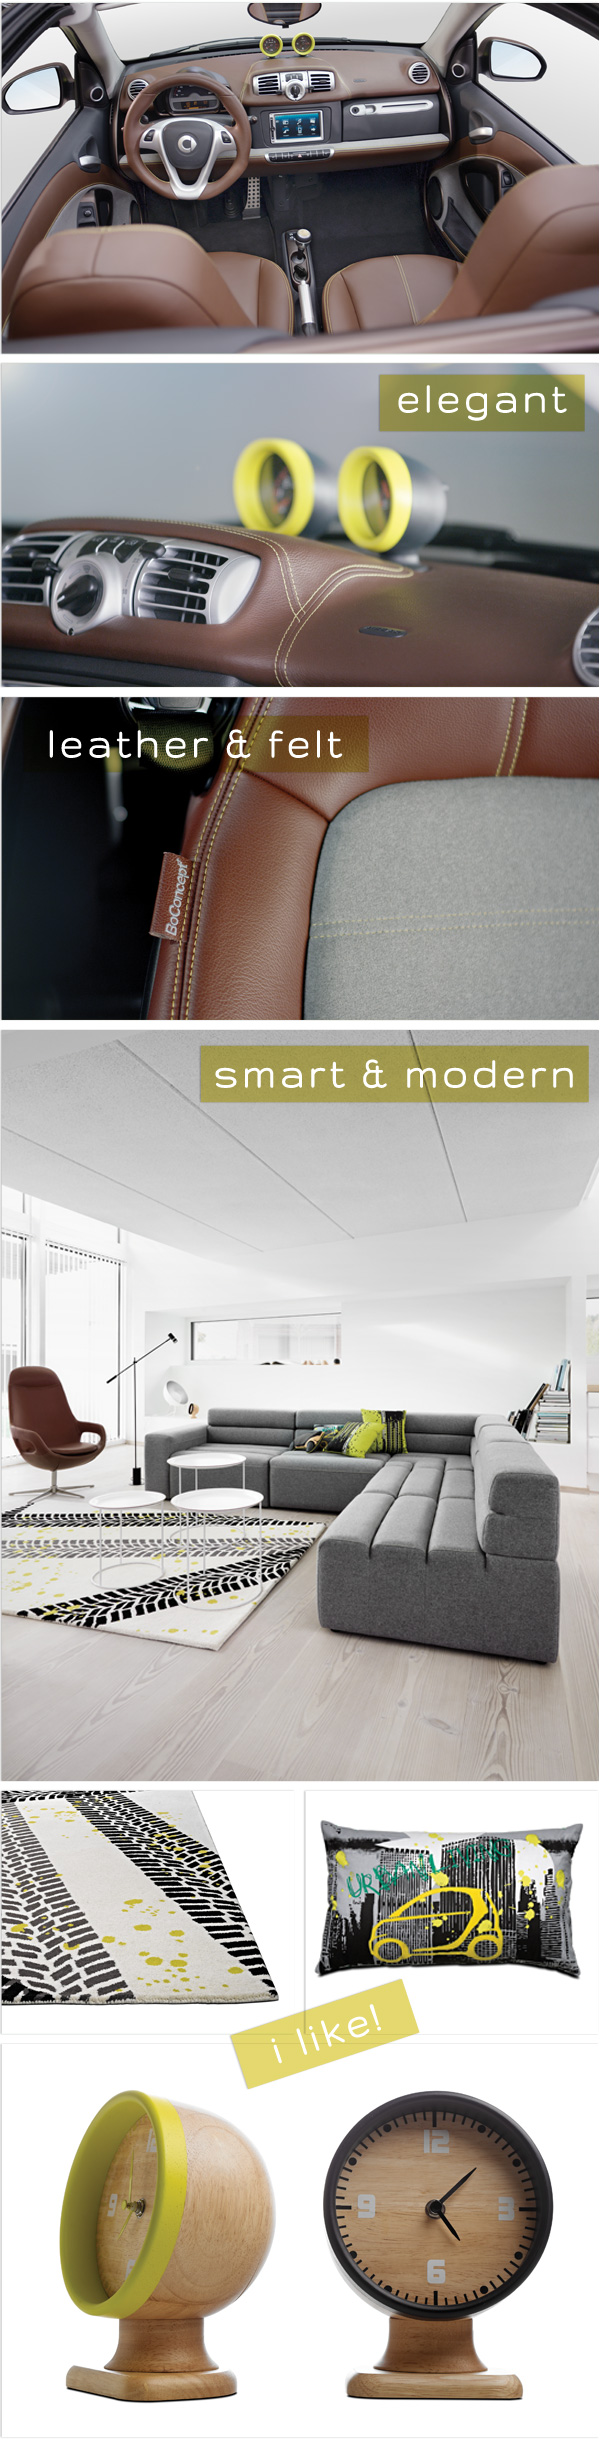 Style: smart & BoConcept